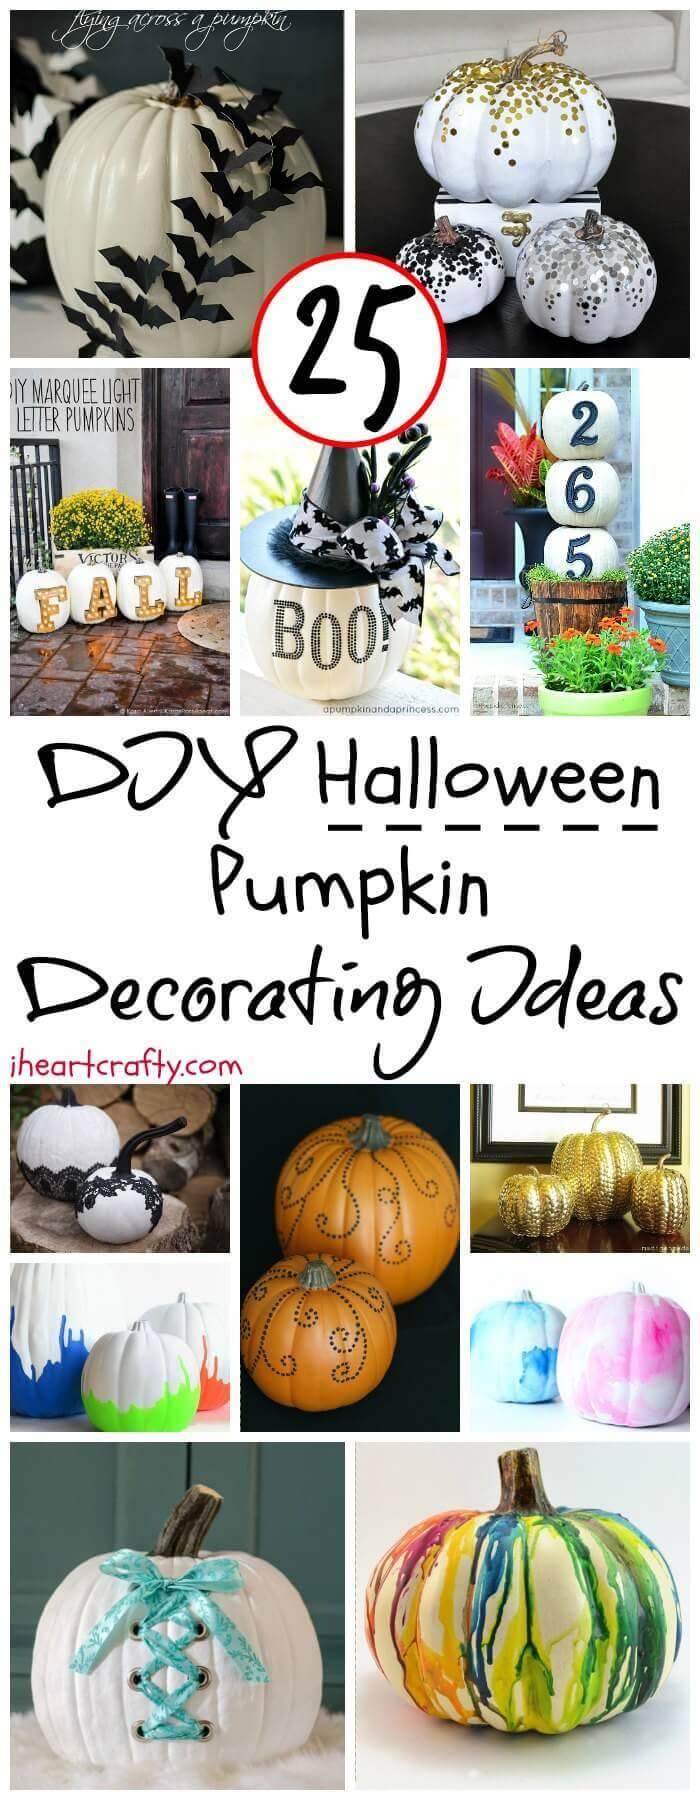 DIY Halloween Pumpkin Decorating Ideas - DIY Fall Decor - DIY Halloween Projects